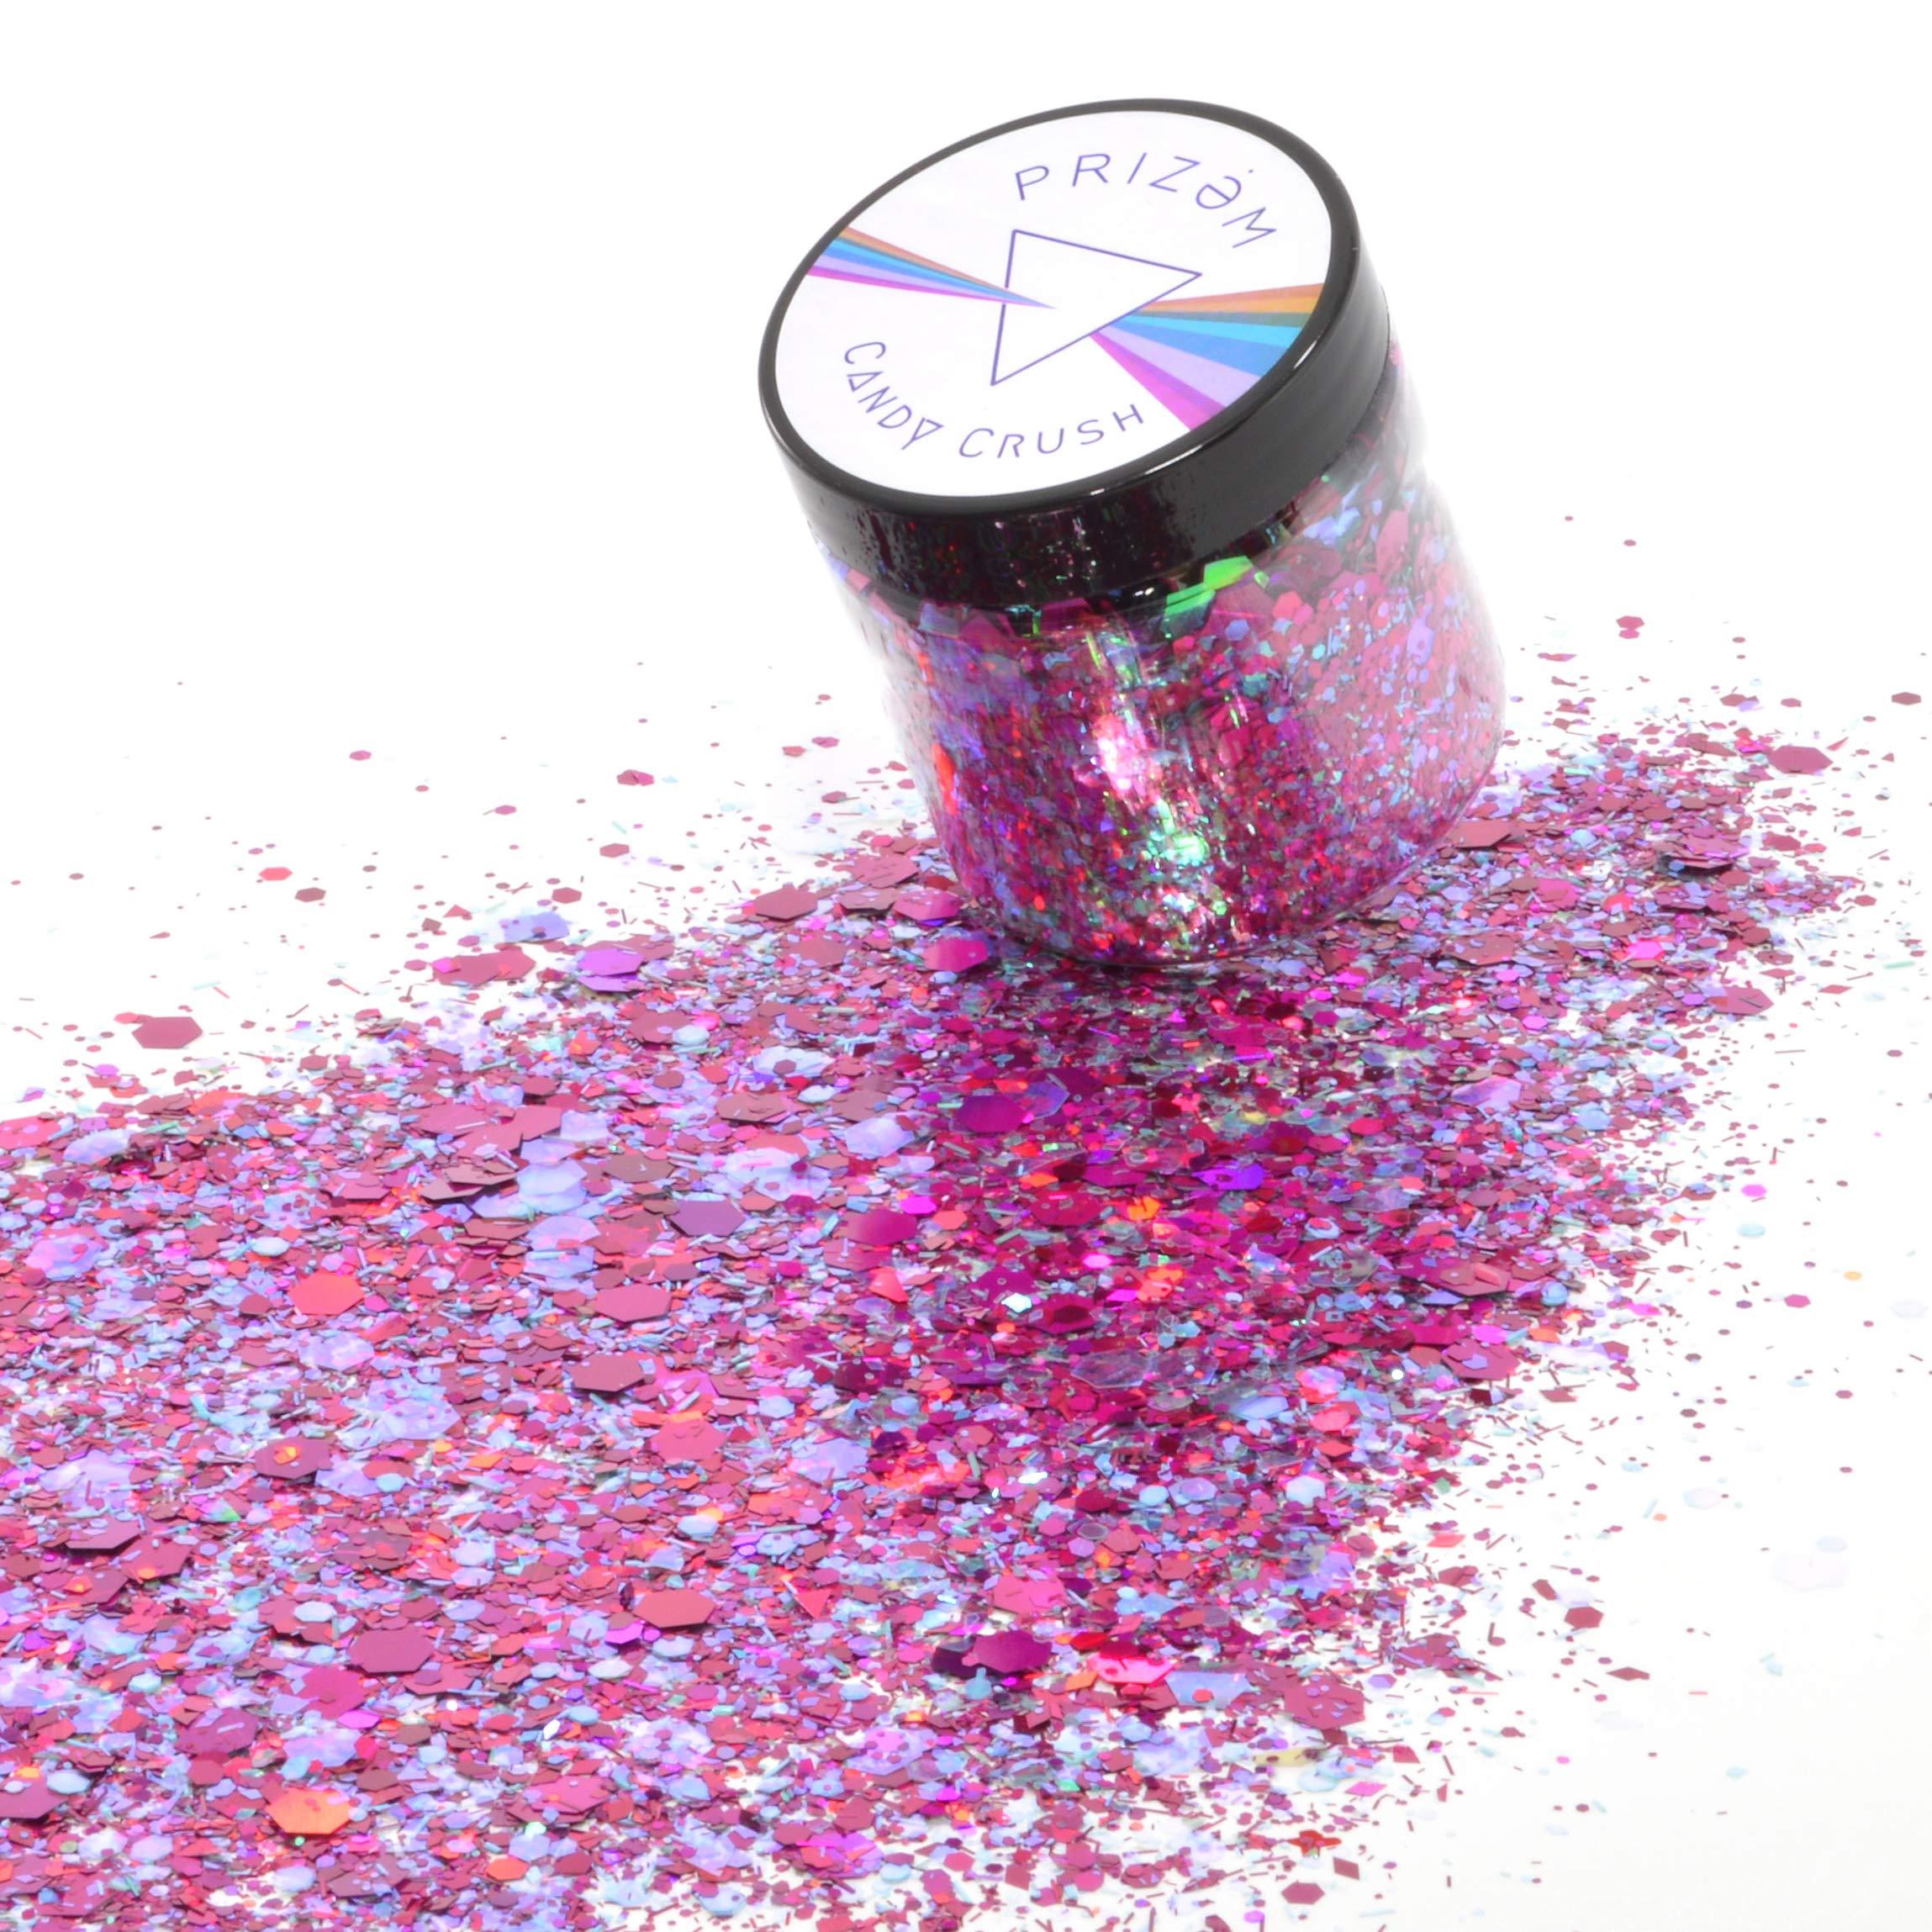 Candy Crush Glitter ▽ 60g ▽ Festival Glitter , Chunky Glitter , Makeup Glitter , Face Glitter , Body Glitter , Glitter Makeup , Hair Glitter , Cosmetic Glitter , Nail Glitter , Eyeshadow Glitter